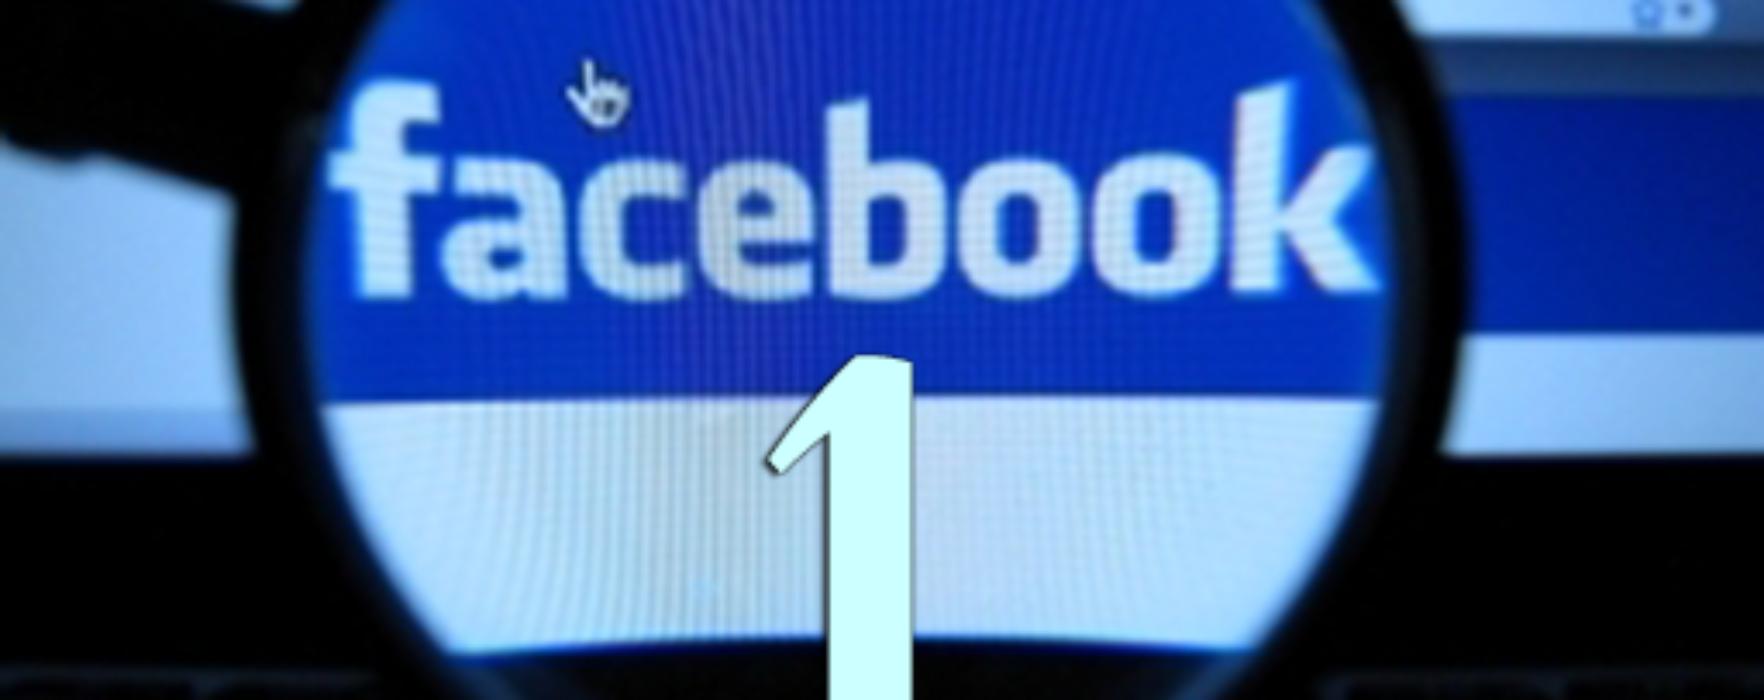 Facebook Explorer 1.0